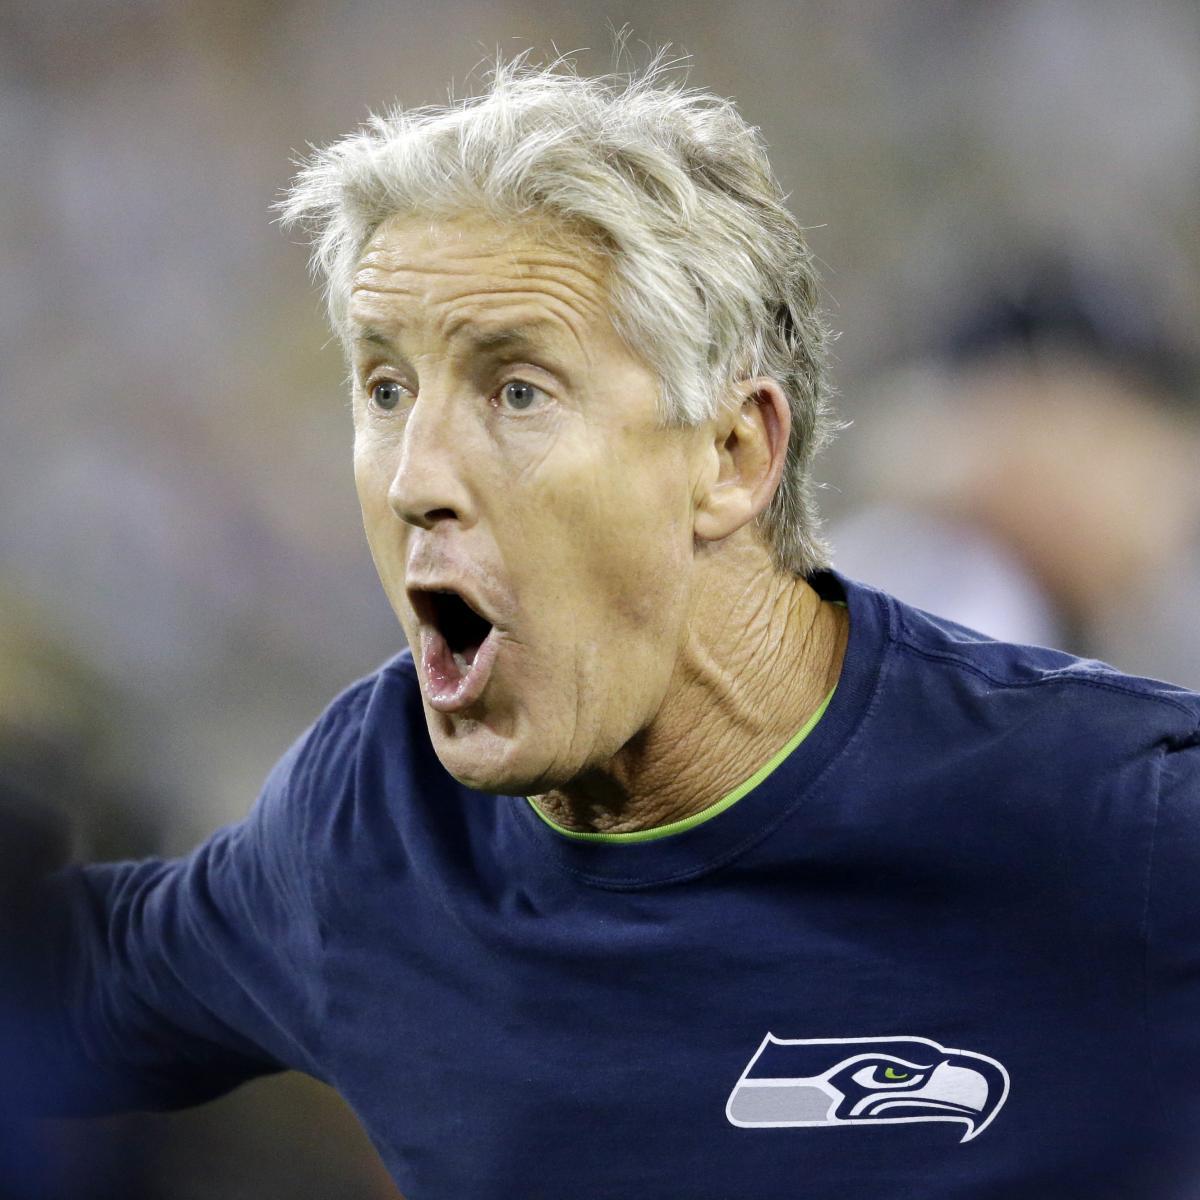 Patriots Staffer Rewatching USC-Texas: No Wonder Carroll Threw in Super Bowl 49